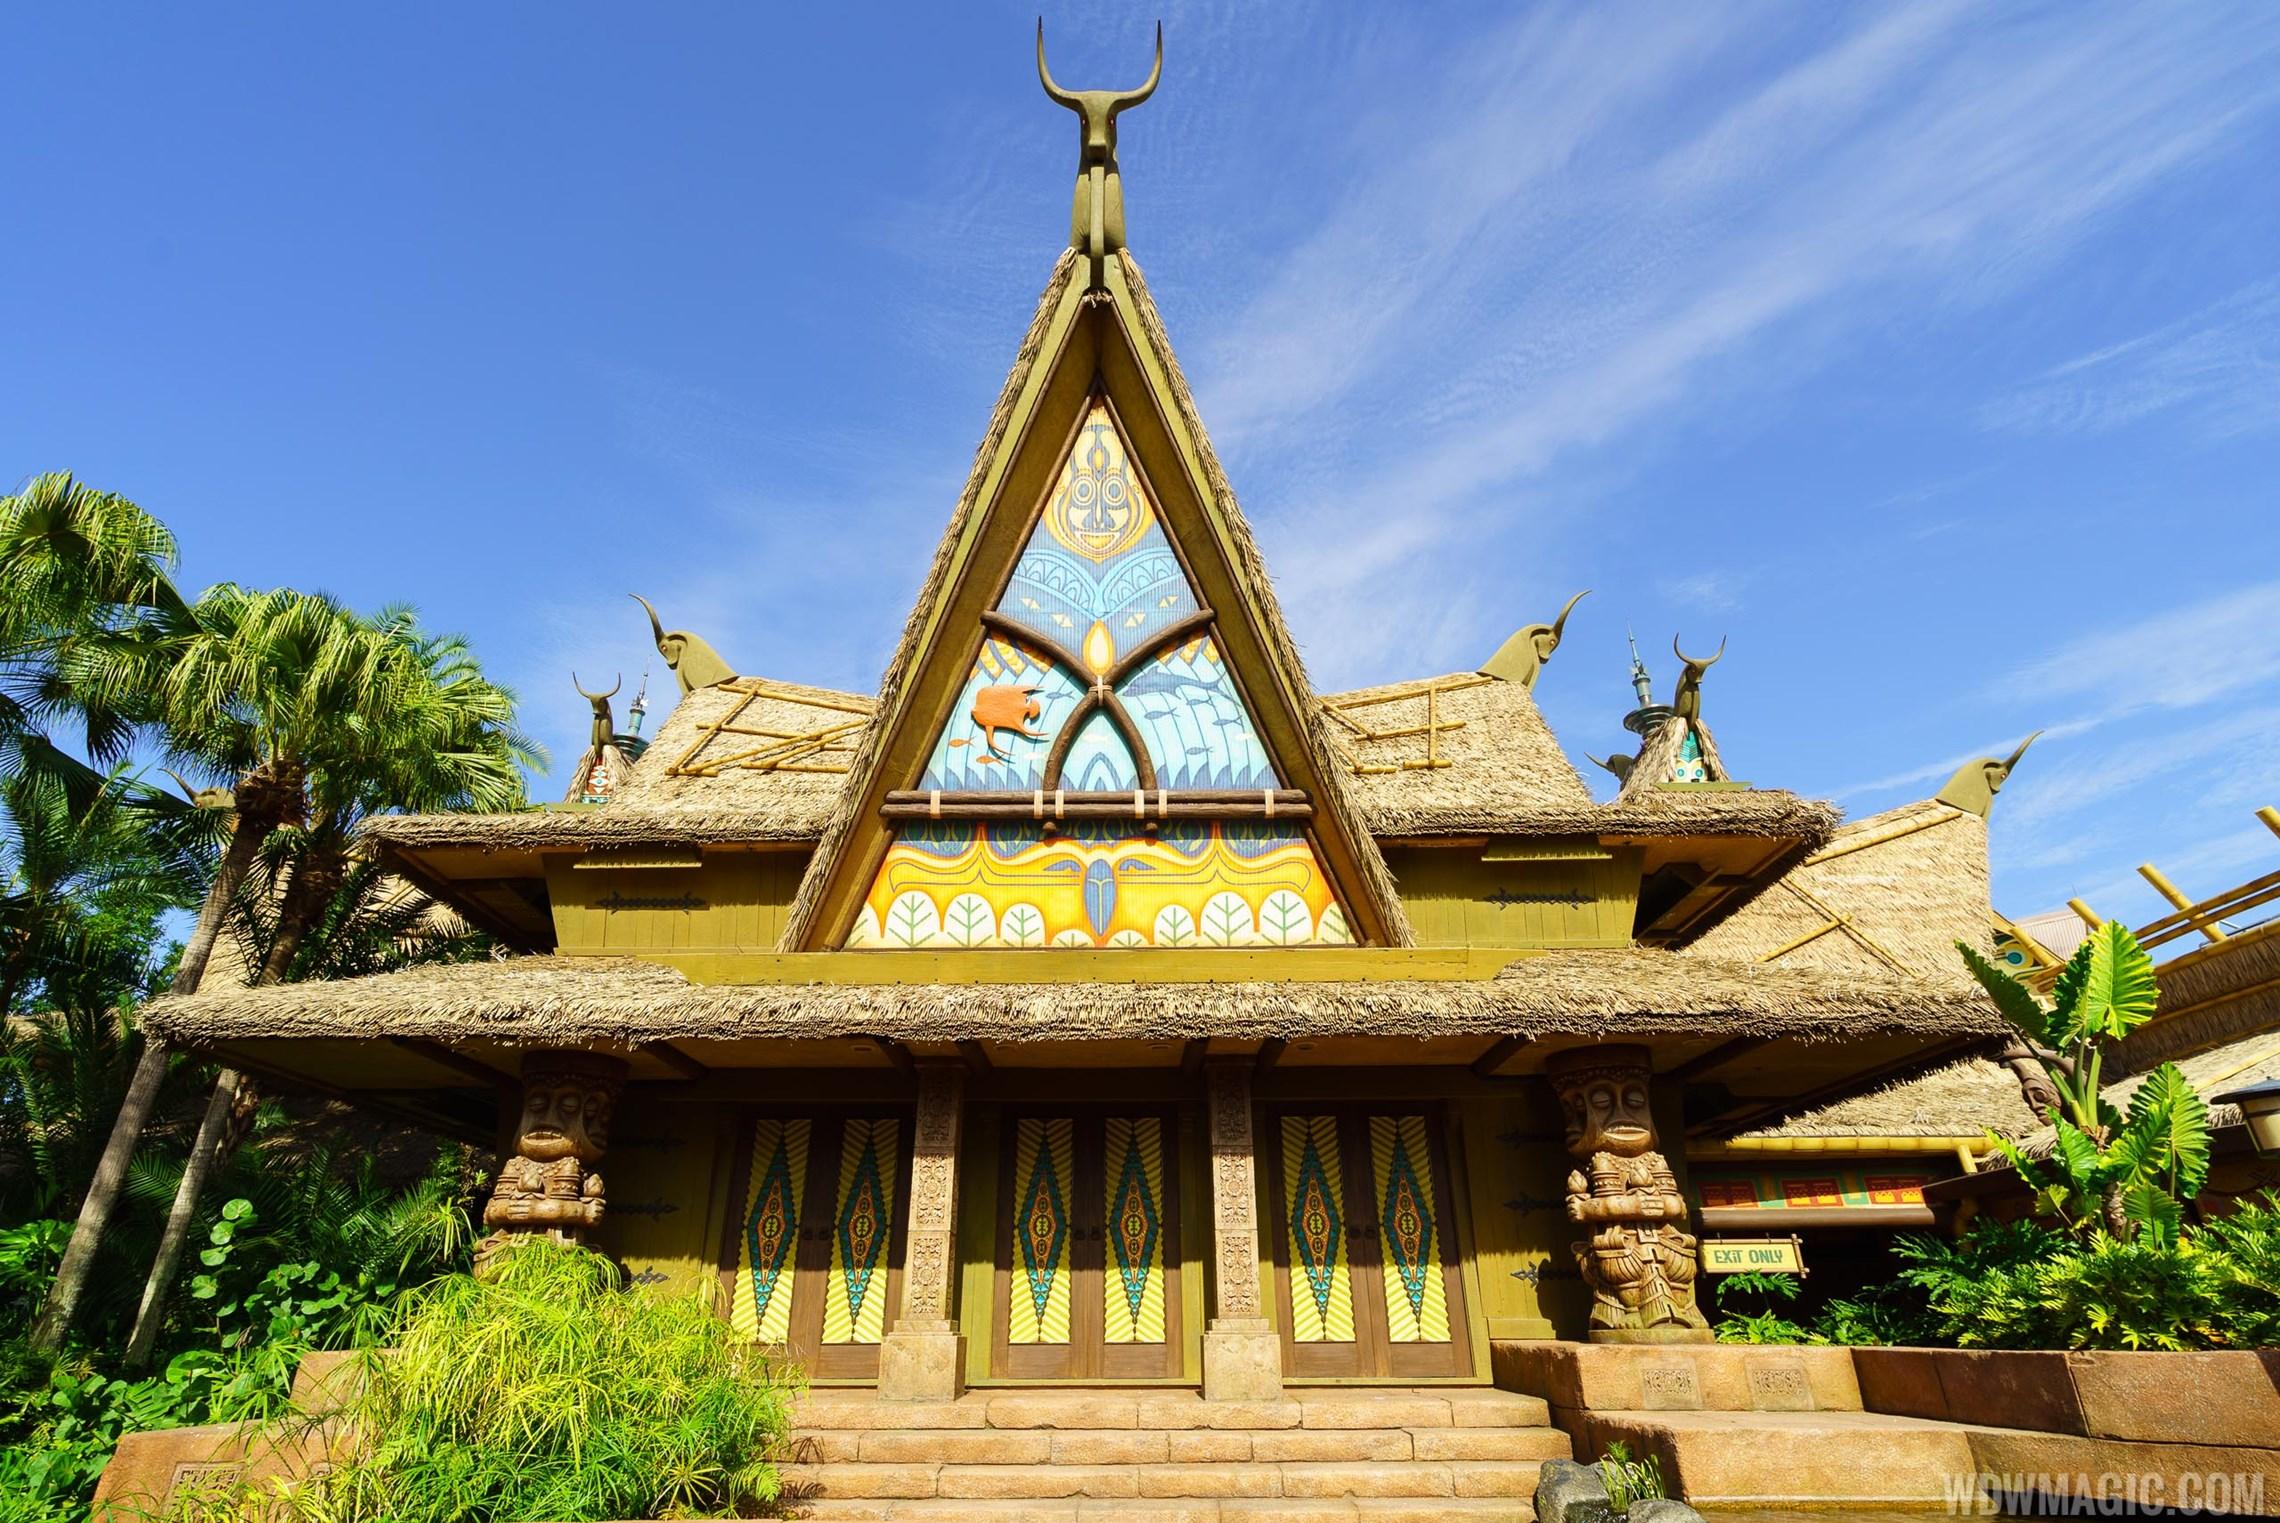 Walt Disney's Enchanted Tiki Room overview